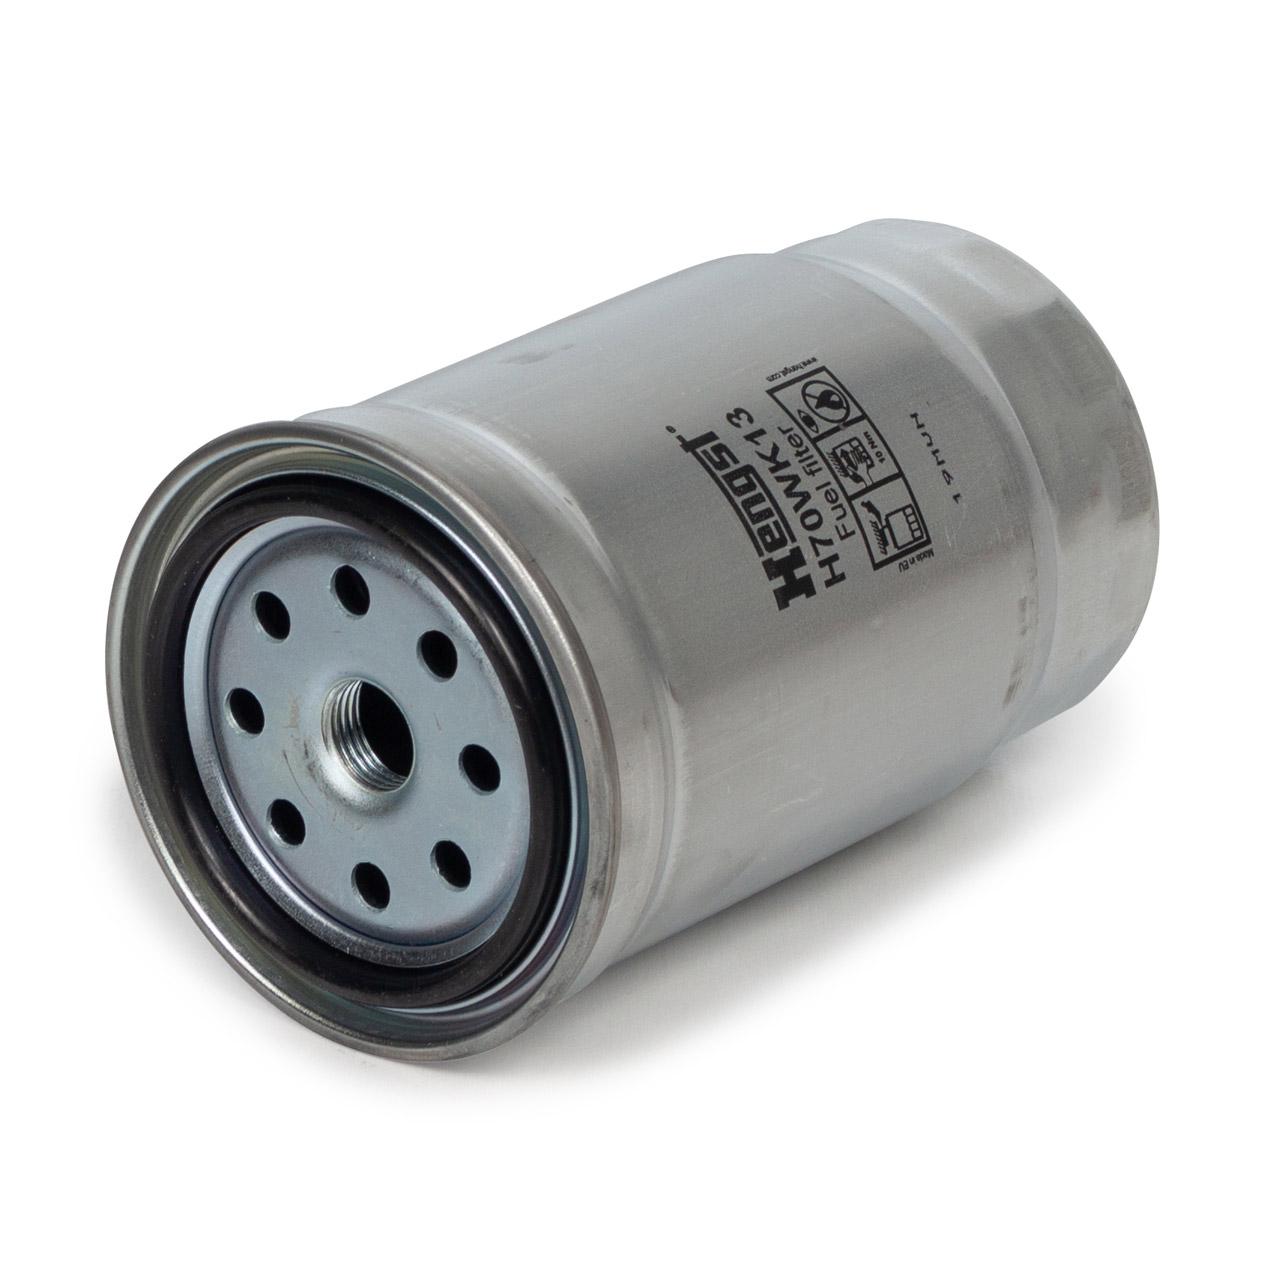 HENGST H70WK13 Kraftstofffilter für HYUNDAI i10 i20 i30 KIA CEE'D PICANTO CRDi